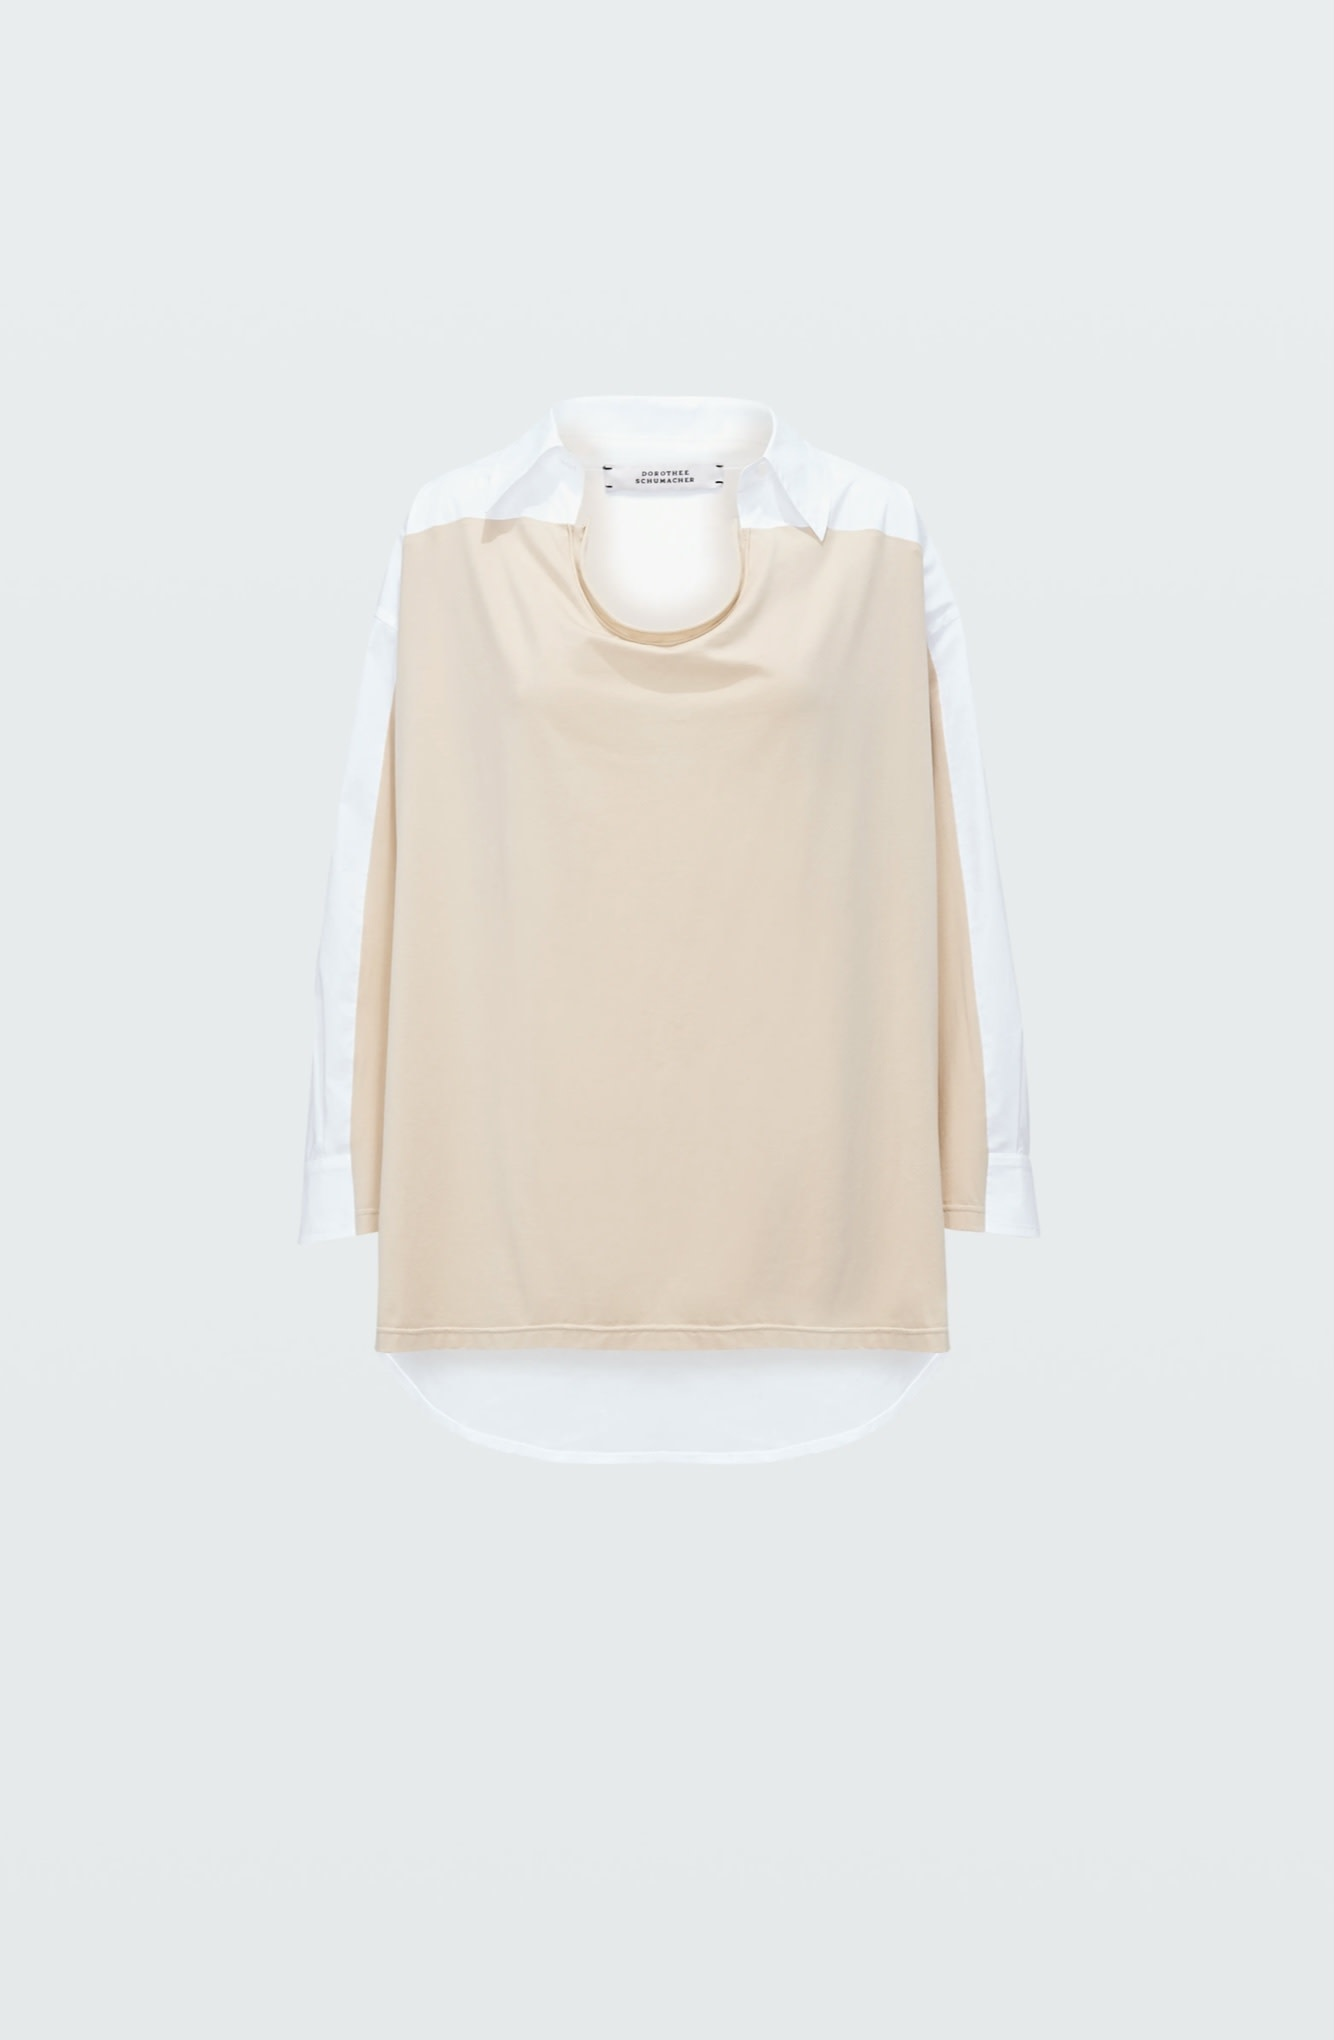 Cool contrast shirt dorothee schumacher-4